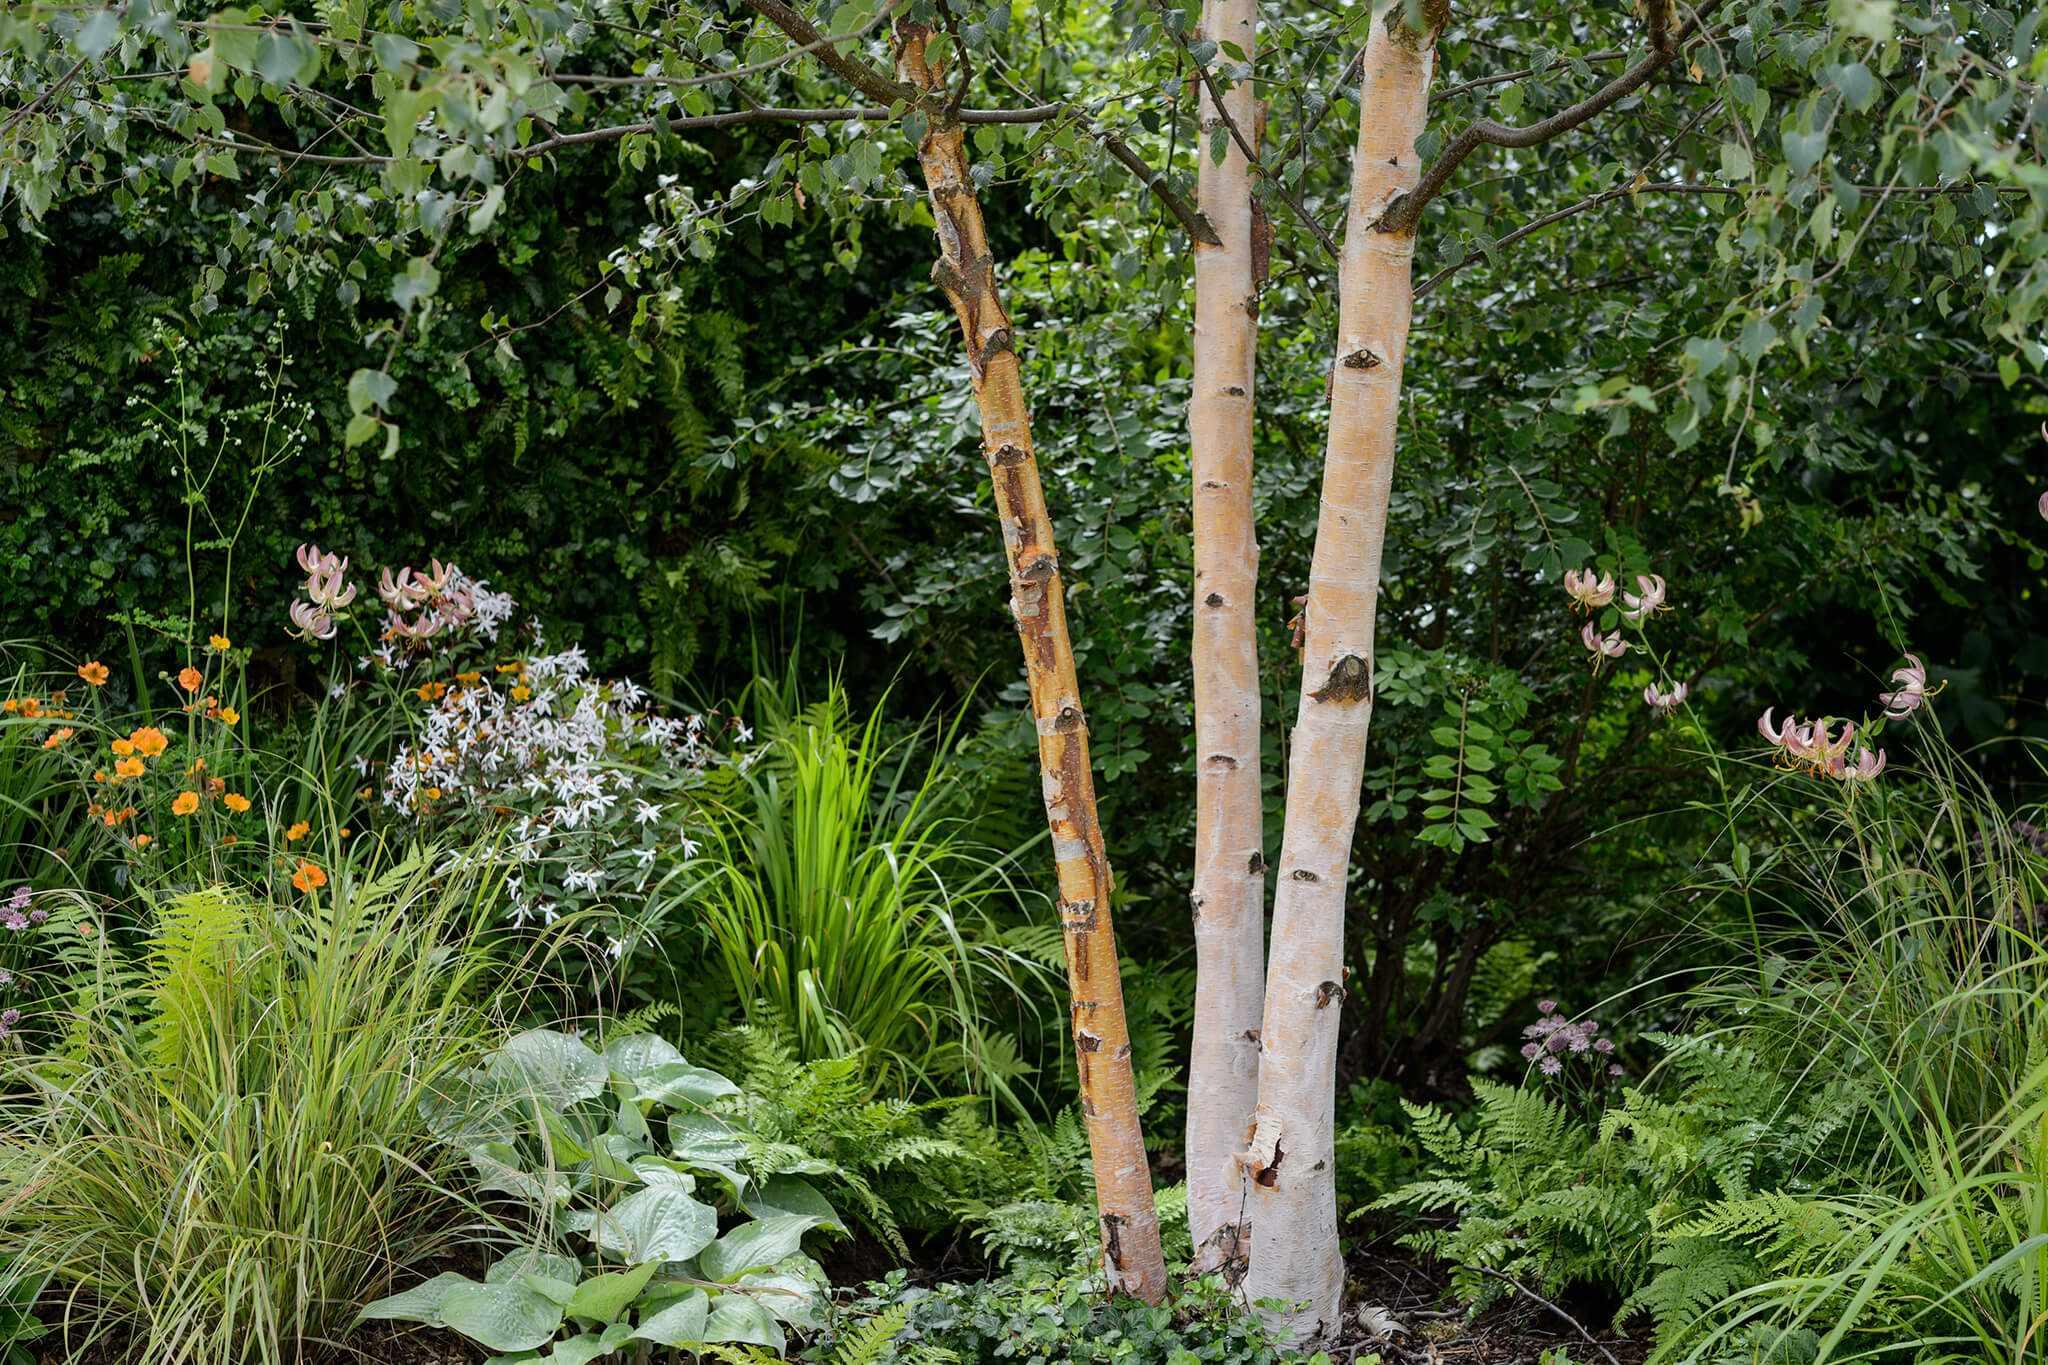 Birch tree (Betula albosinensis) in shady border